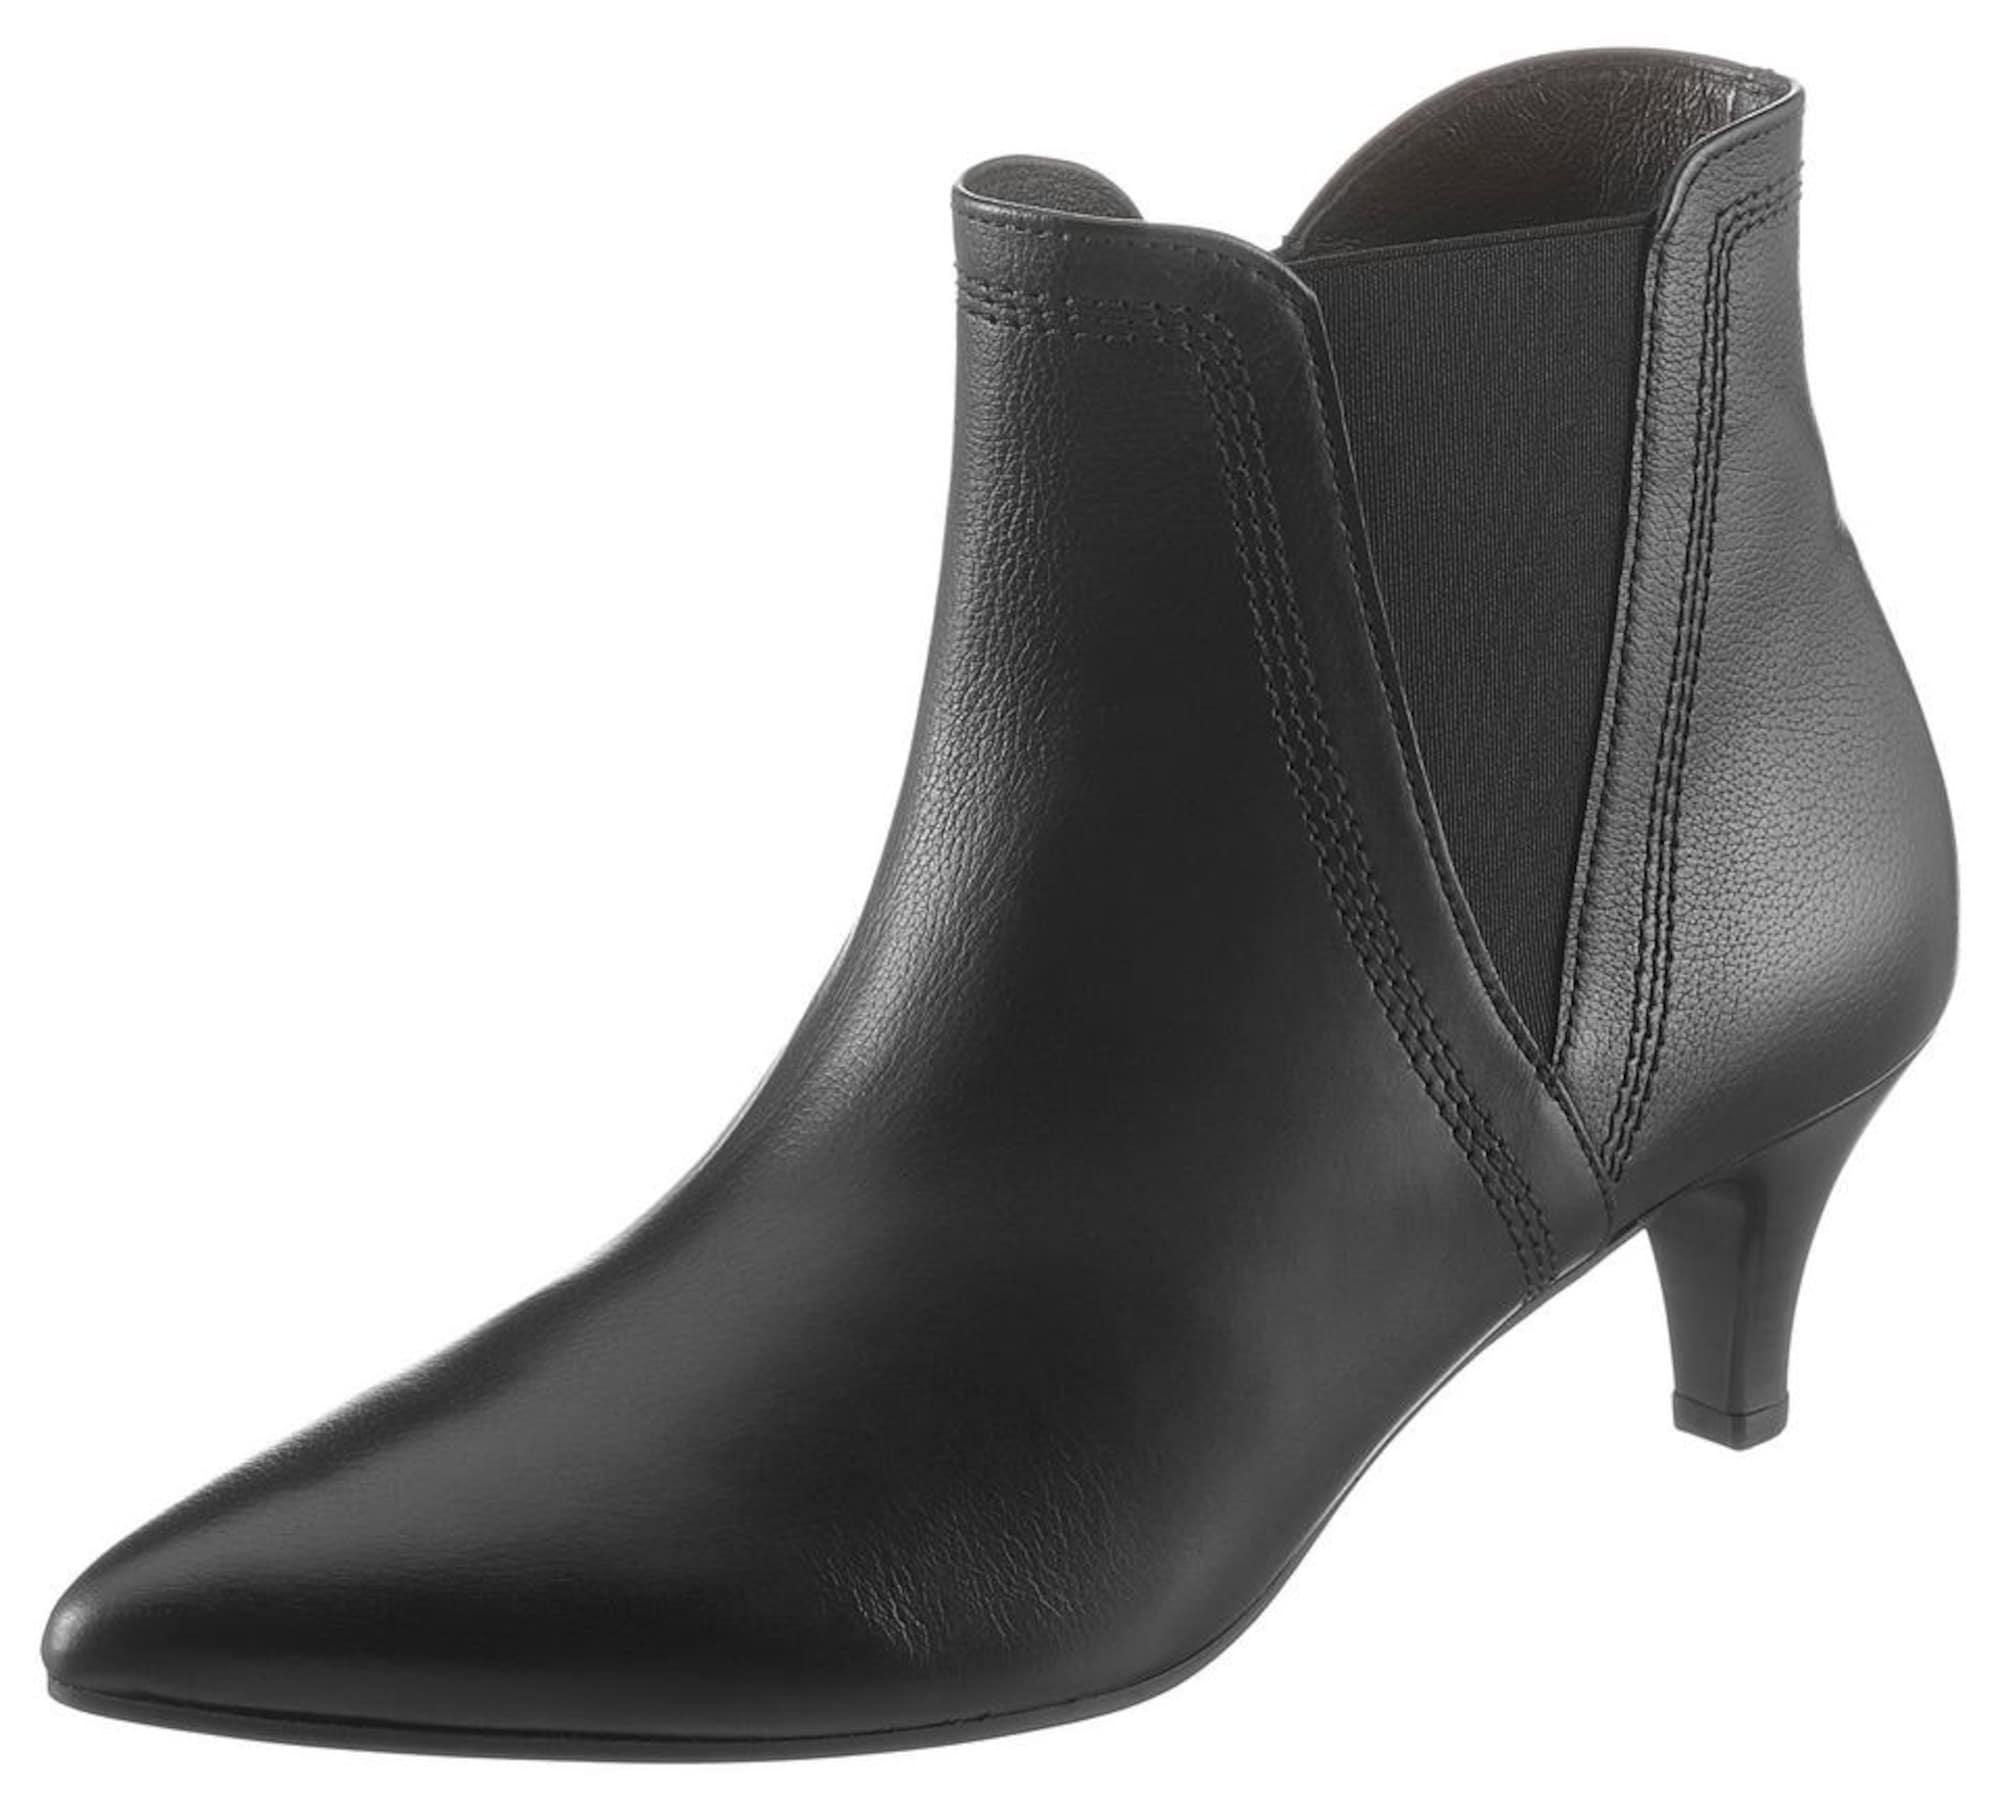 Ankleboots | Schuhe > Stiefeletten > Ankleboots | Gabor